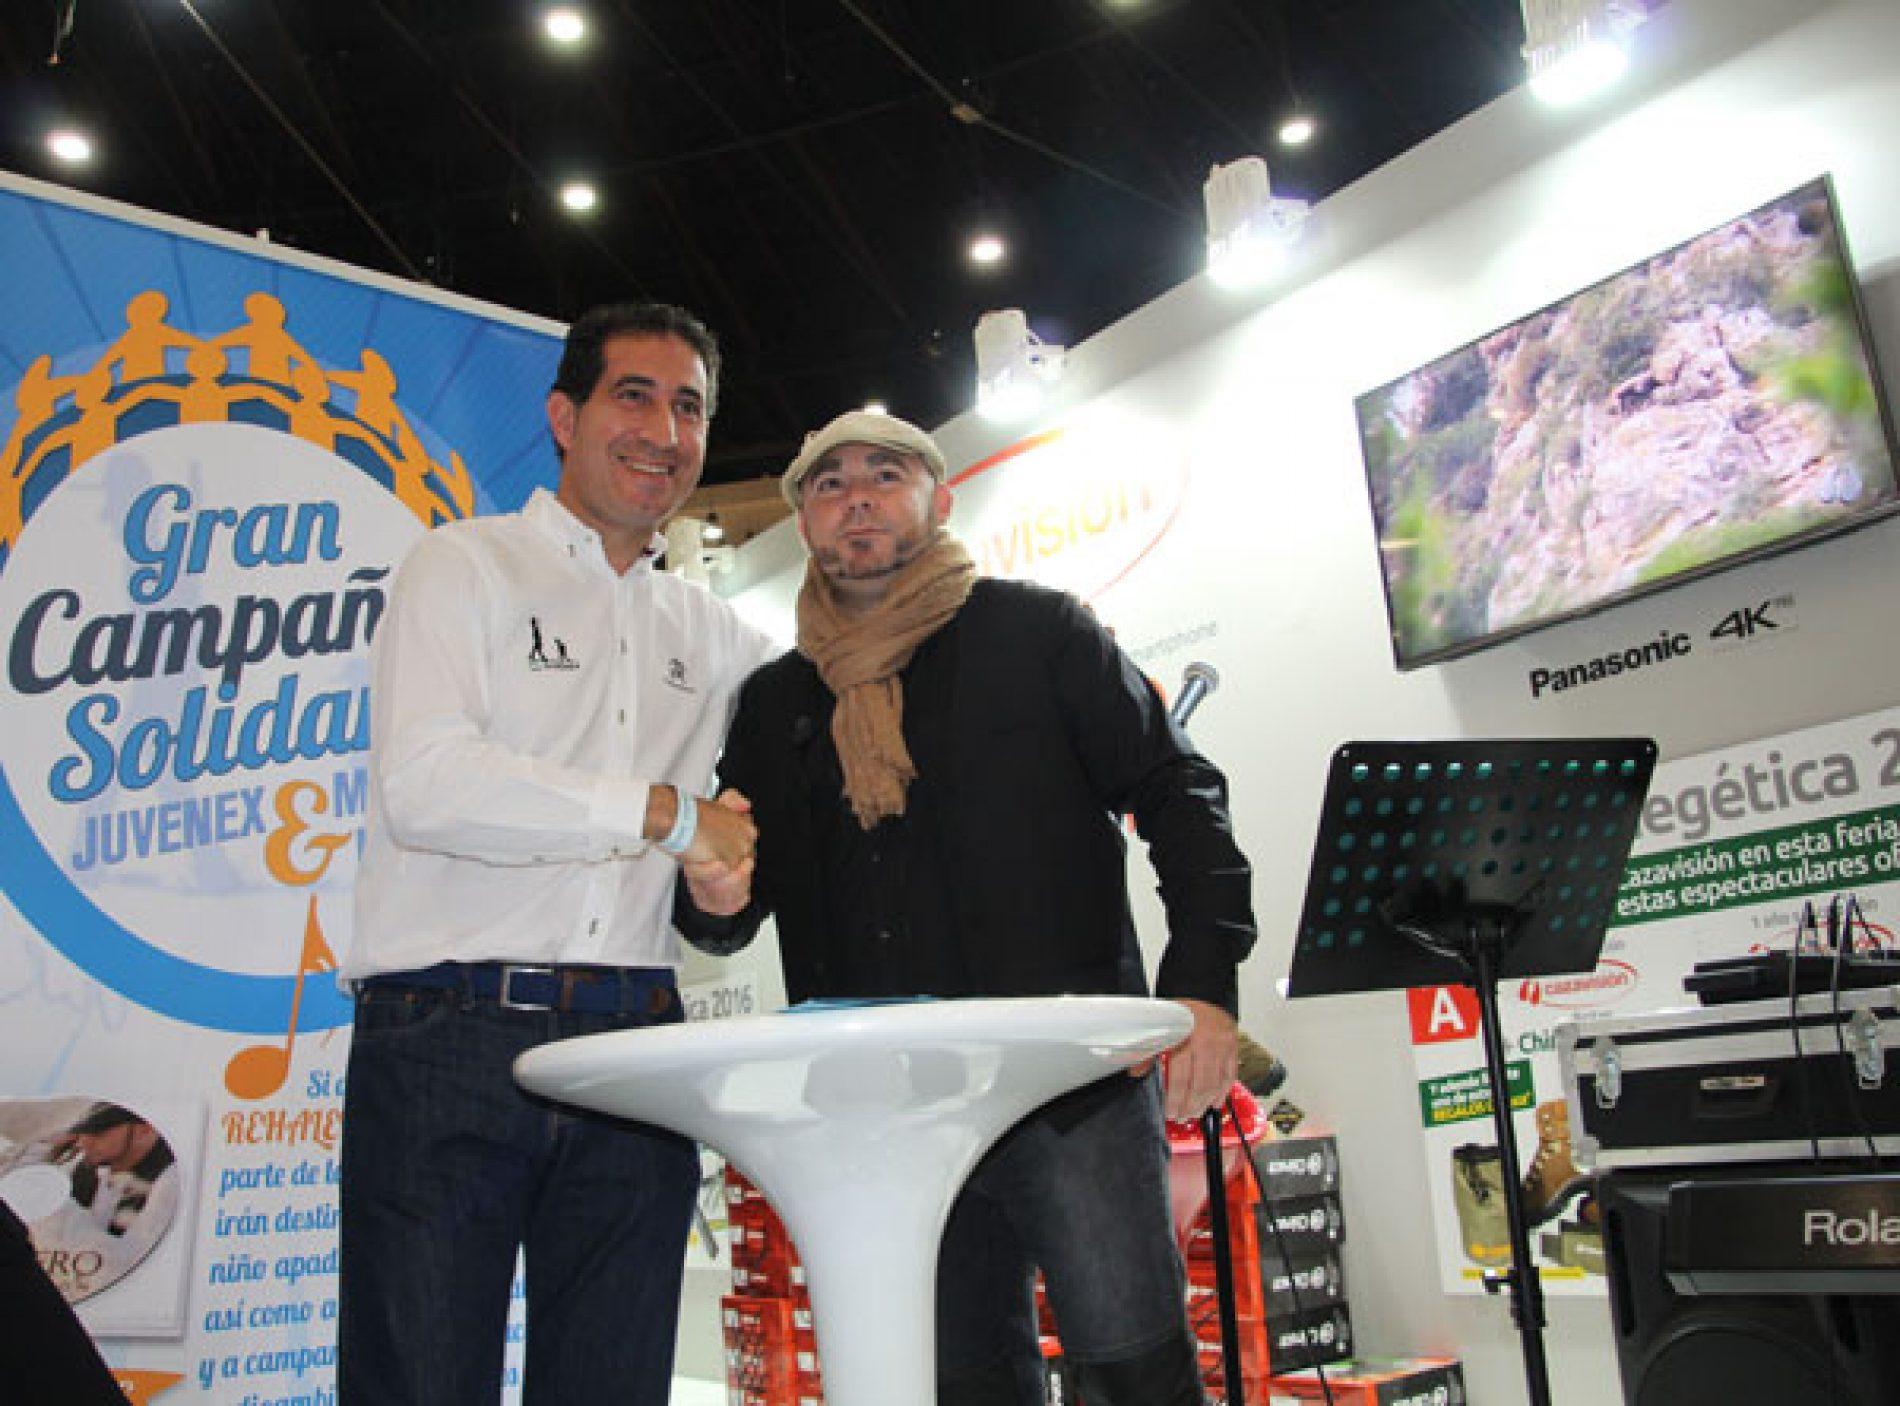 Campaña solidaria: Juvenex & Manuel Picón